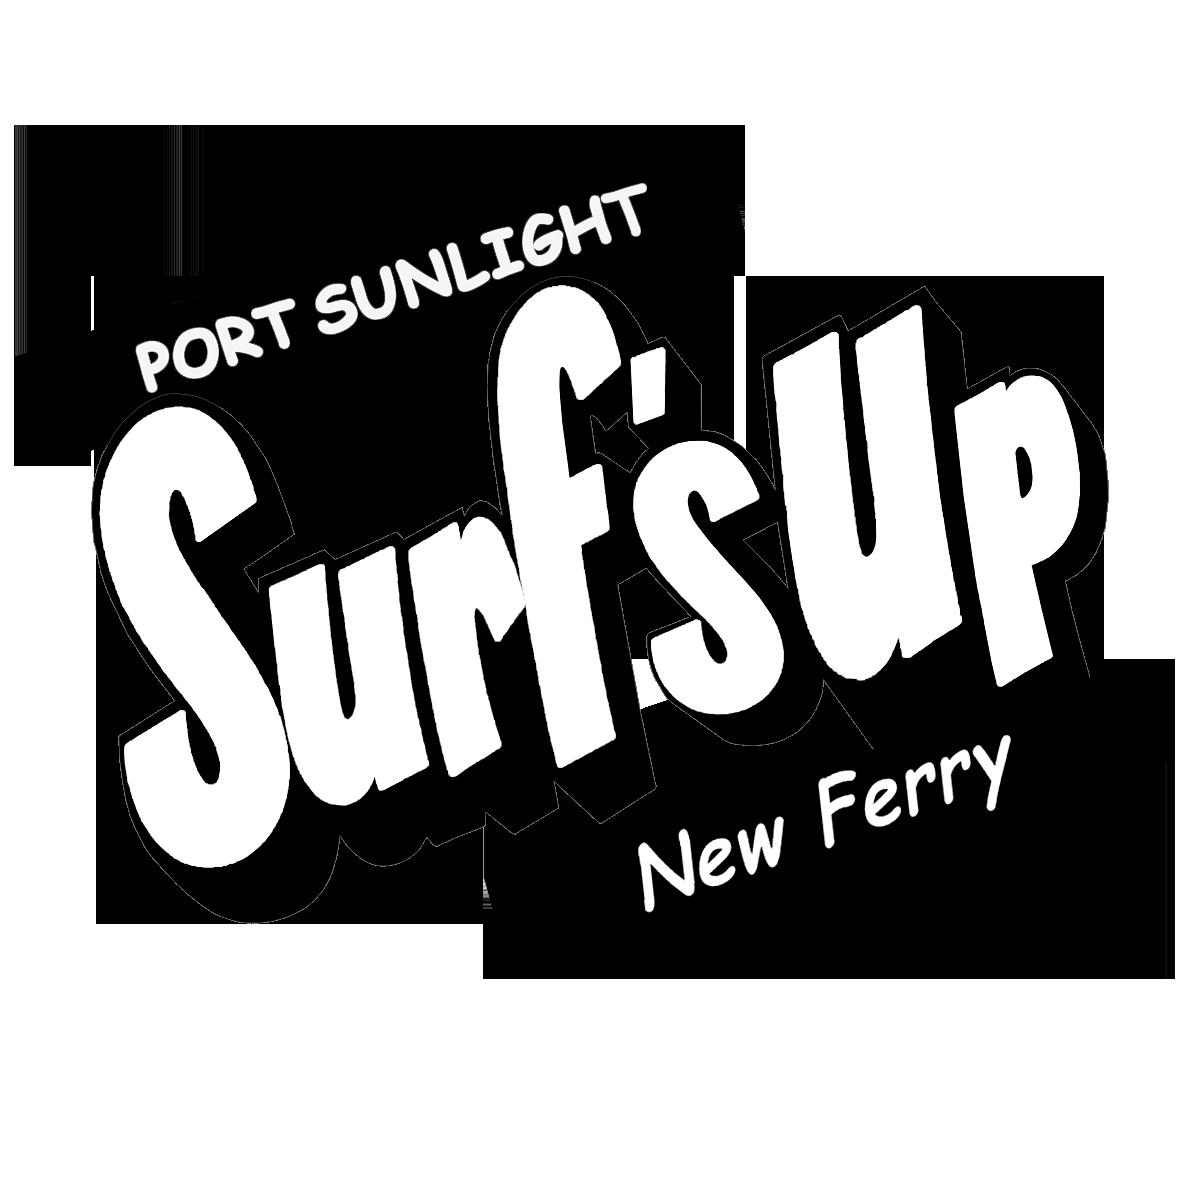 Port Sunlight (new Ferry) Surf's Up